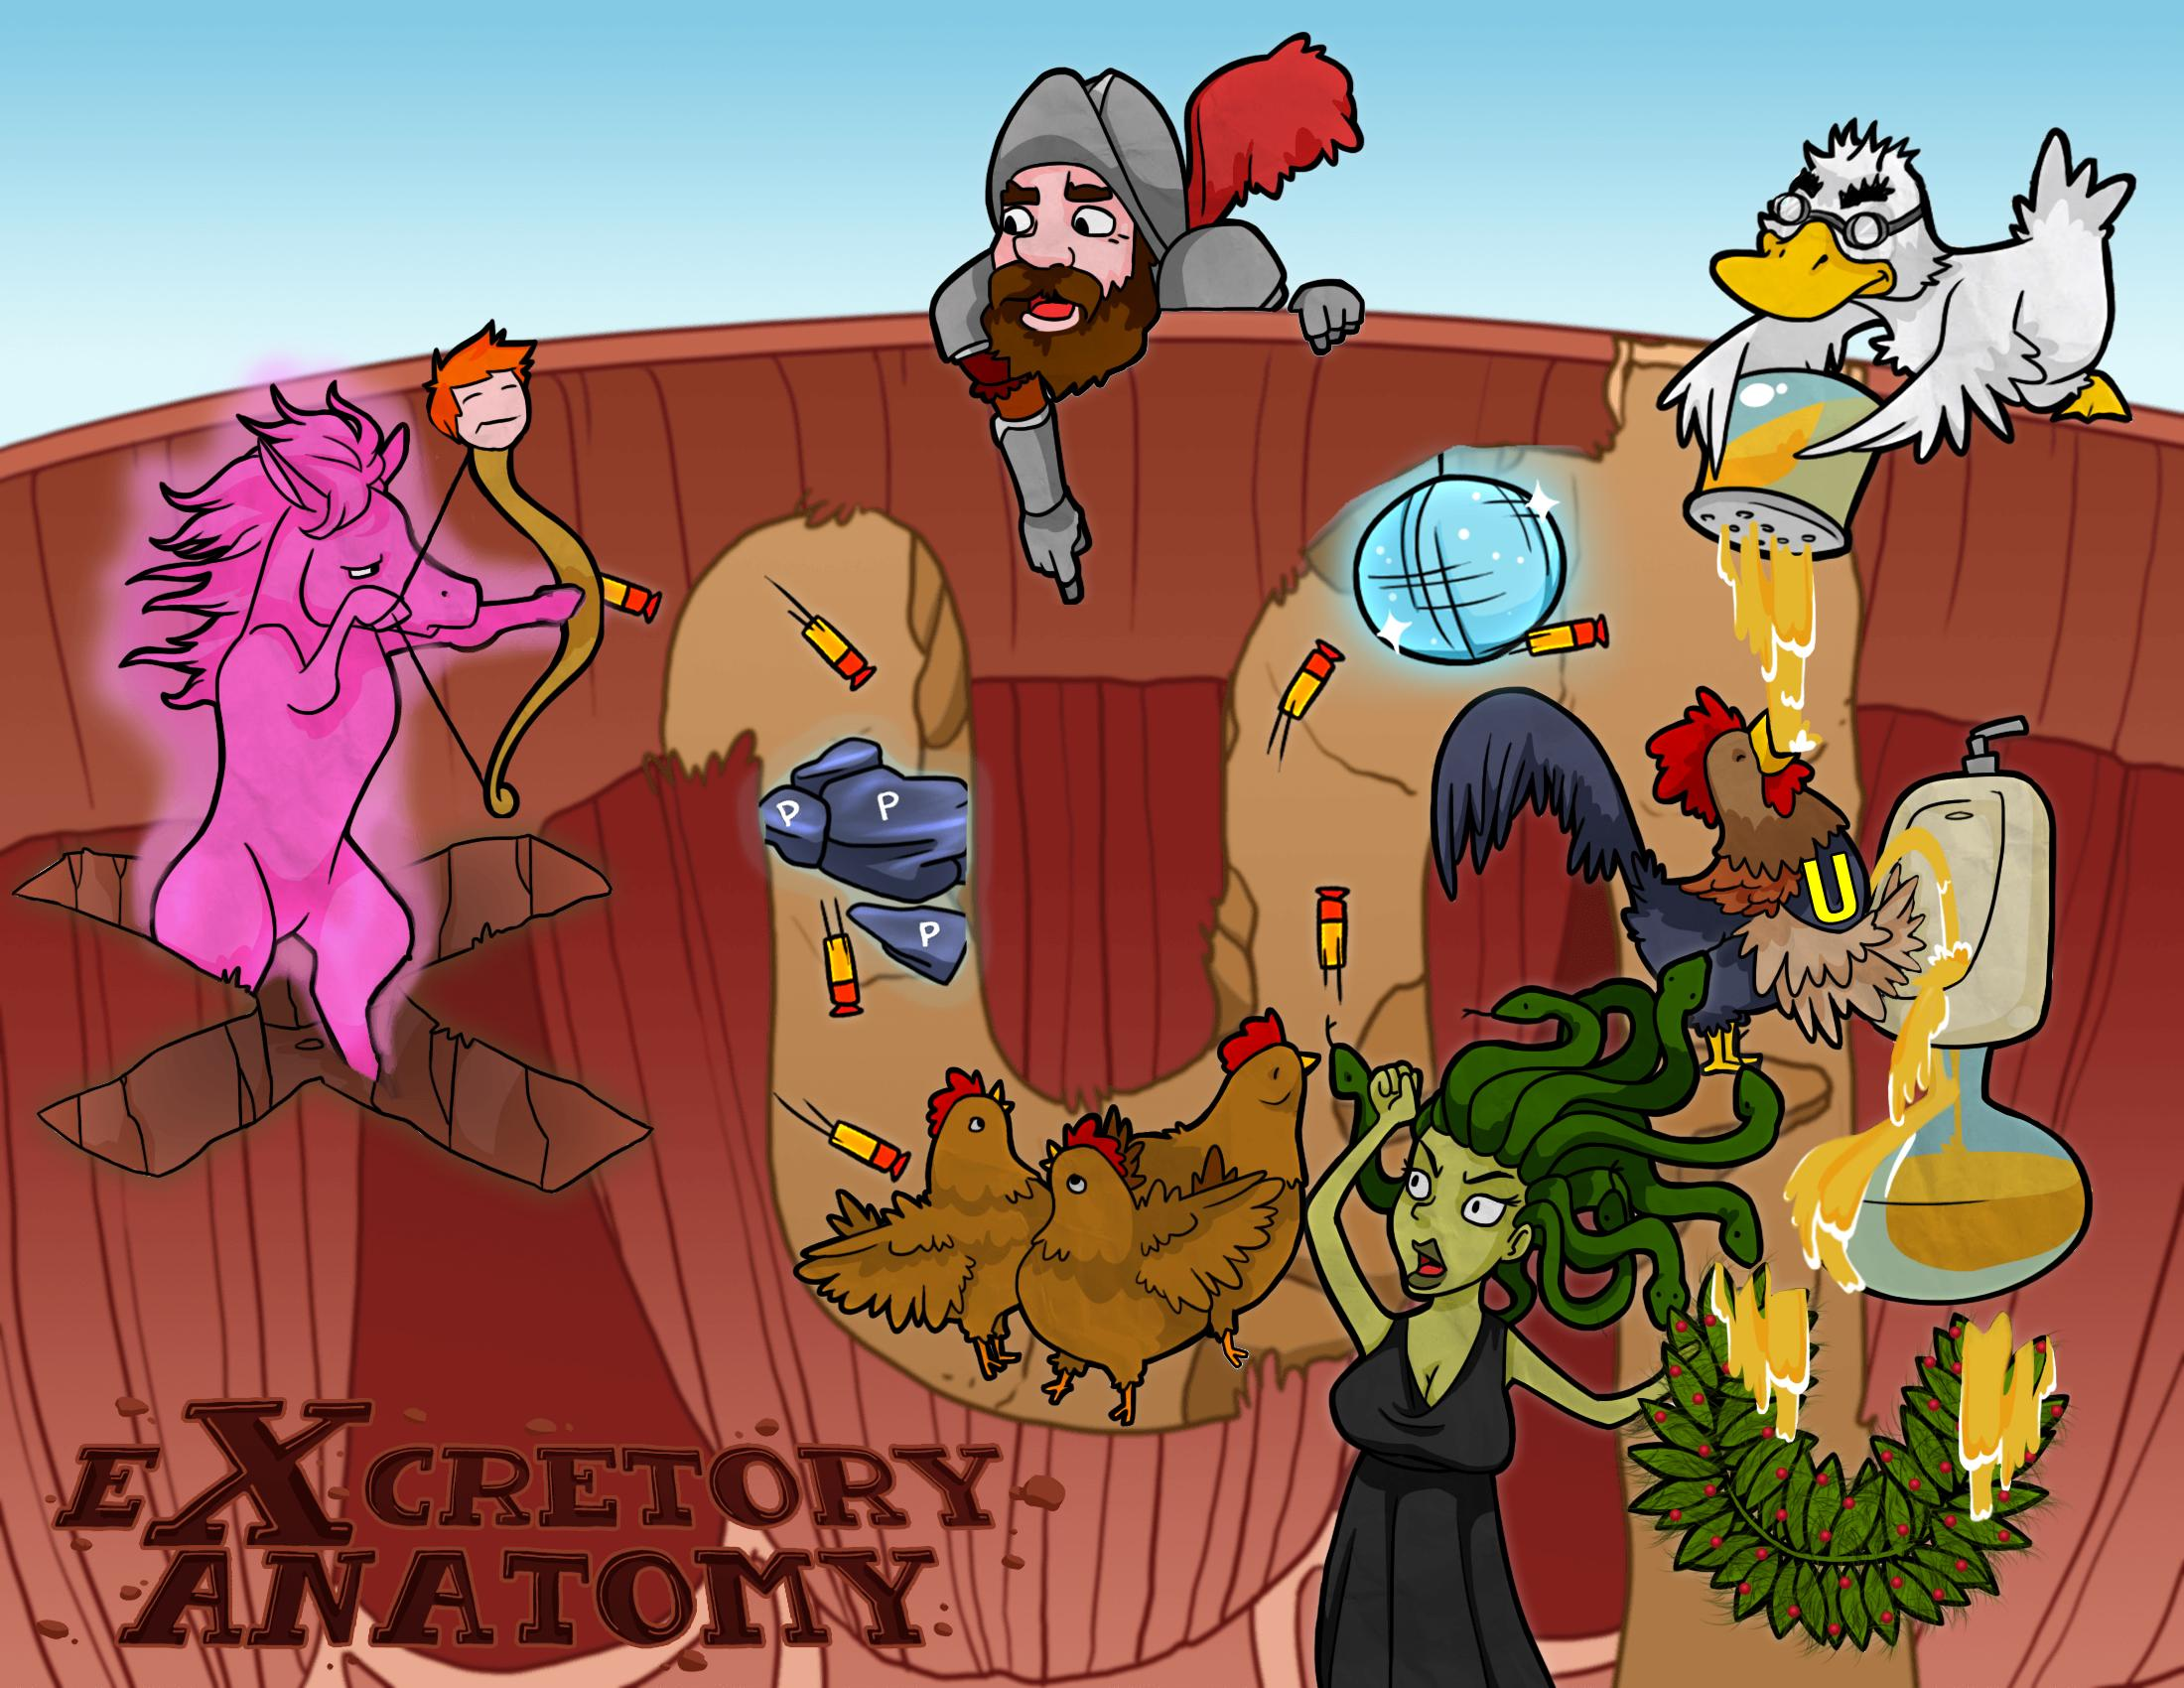 Urinary Excretory Anatomy